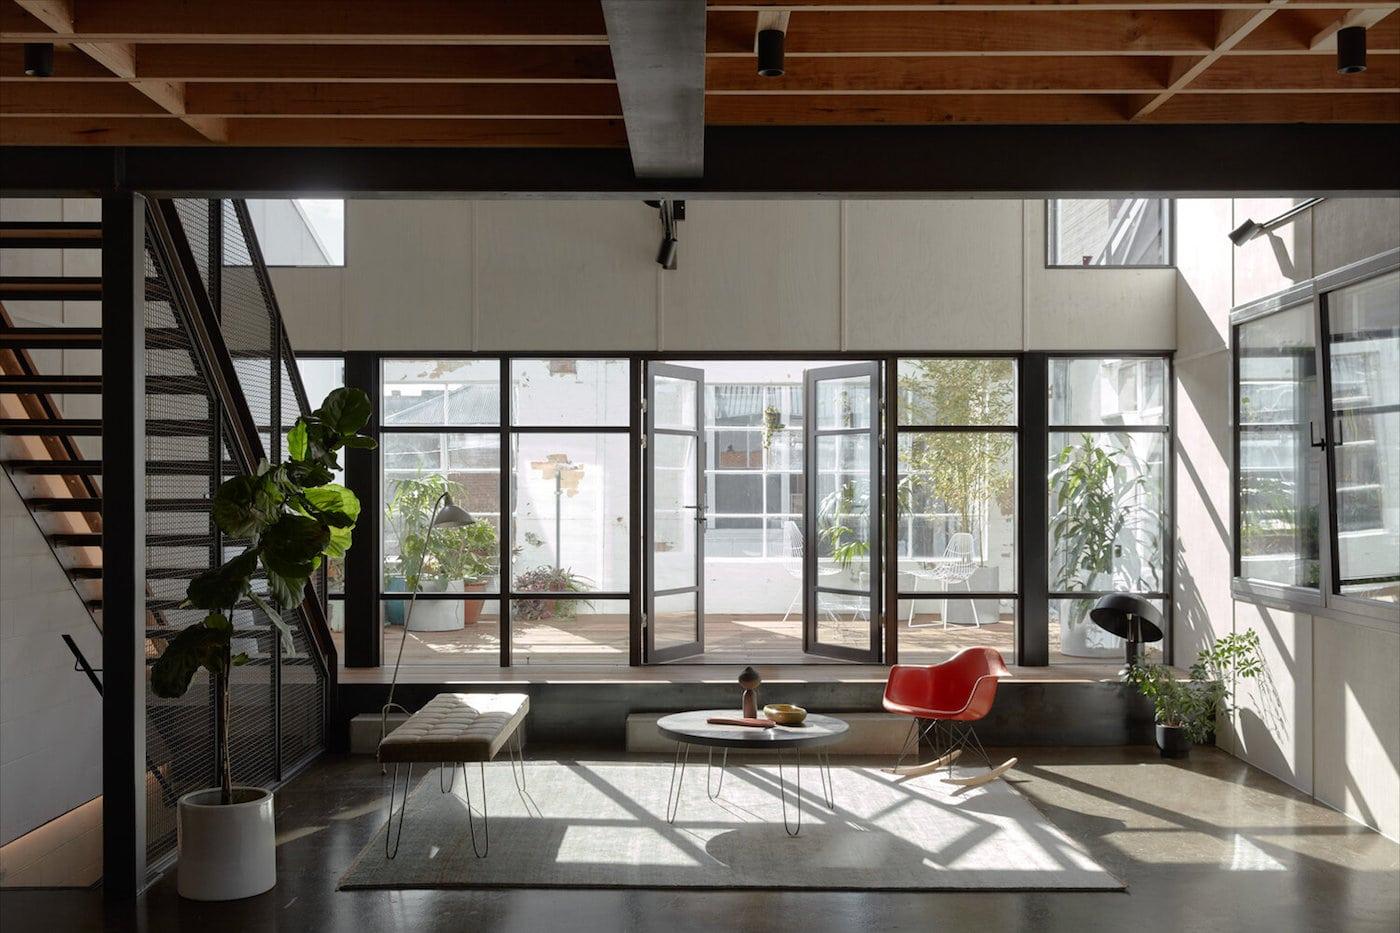 Eco Edition_Breathe Architecture_Warehouse Greenhouse_Architecture sustainability 3-min